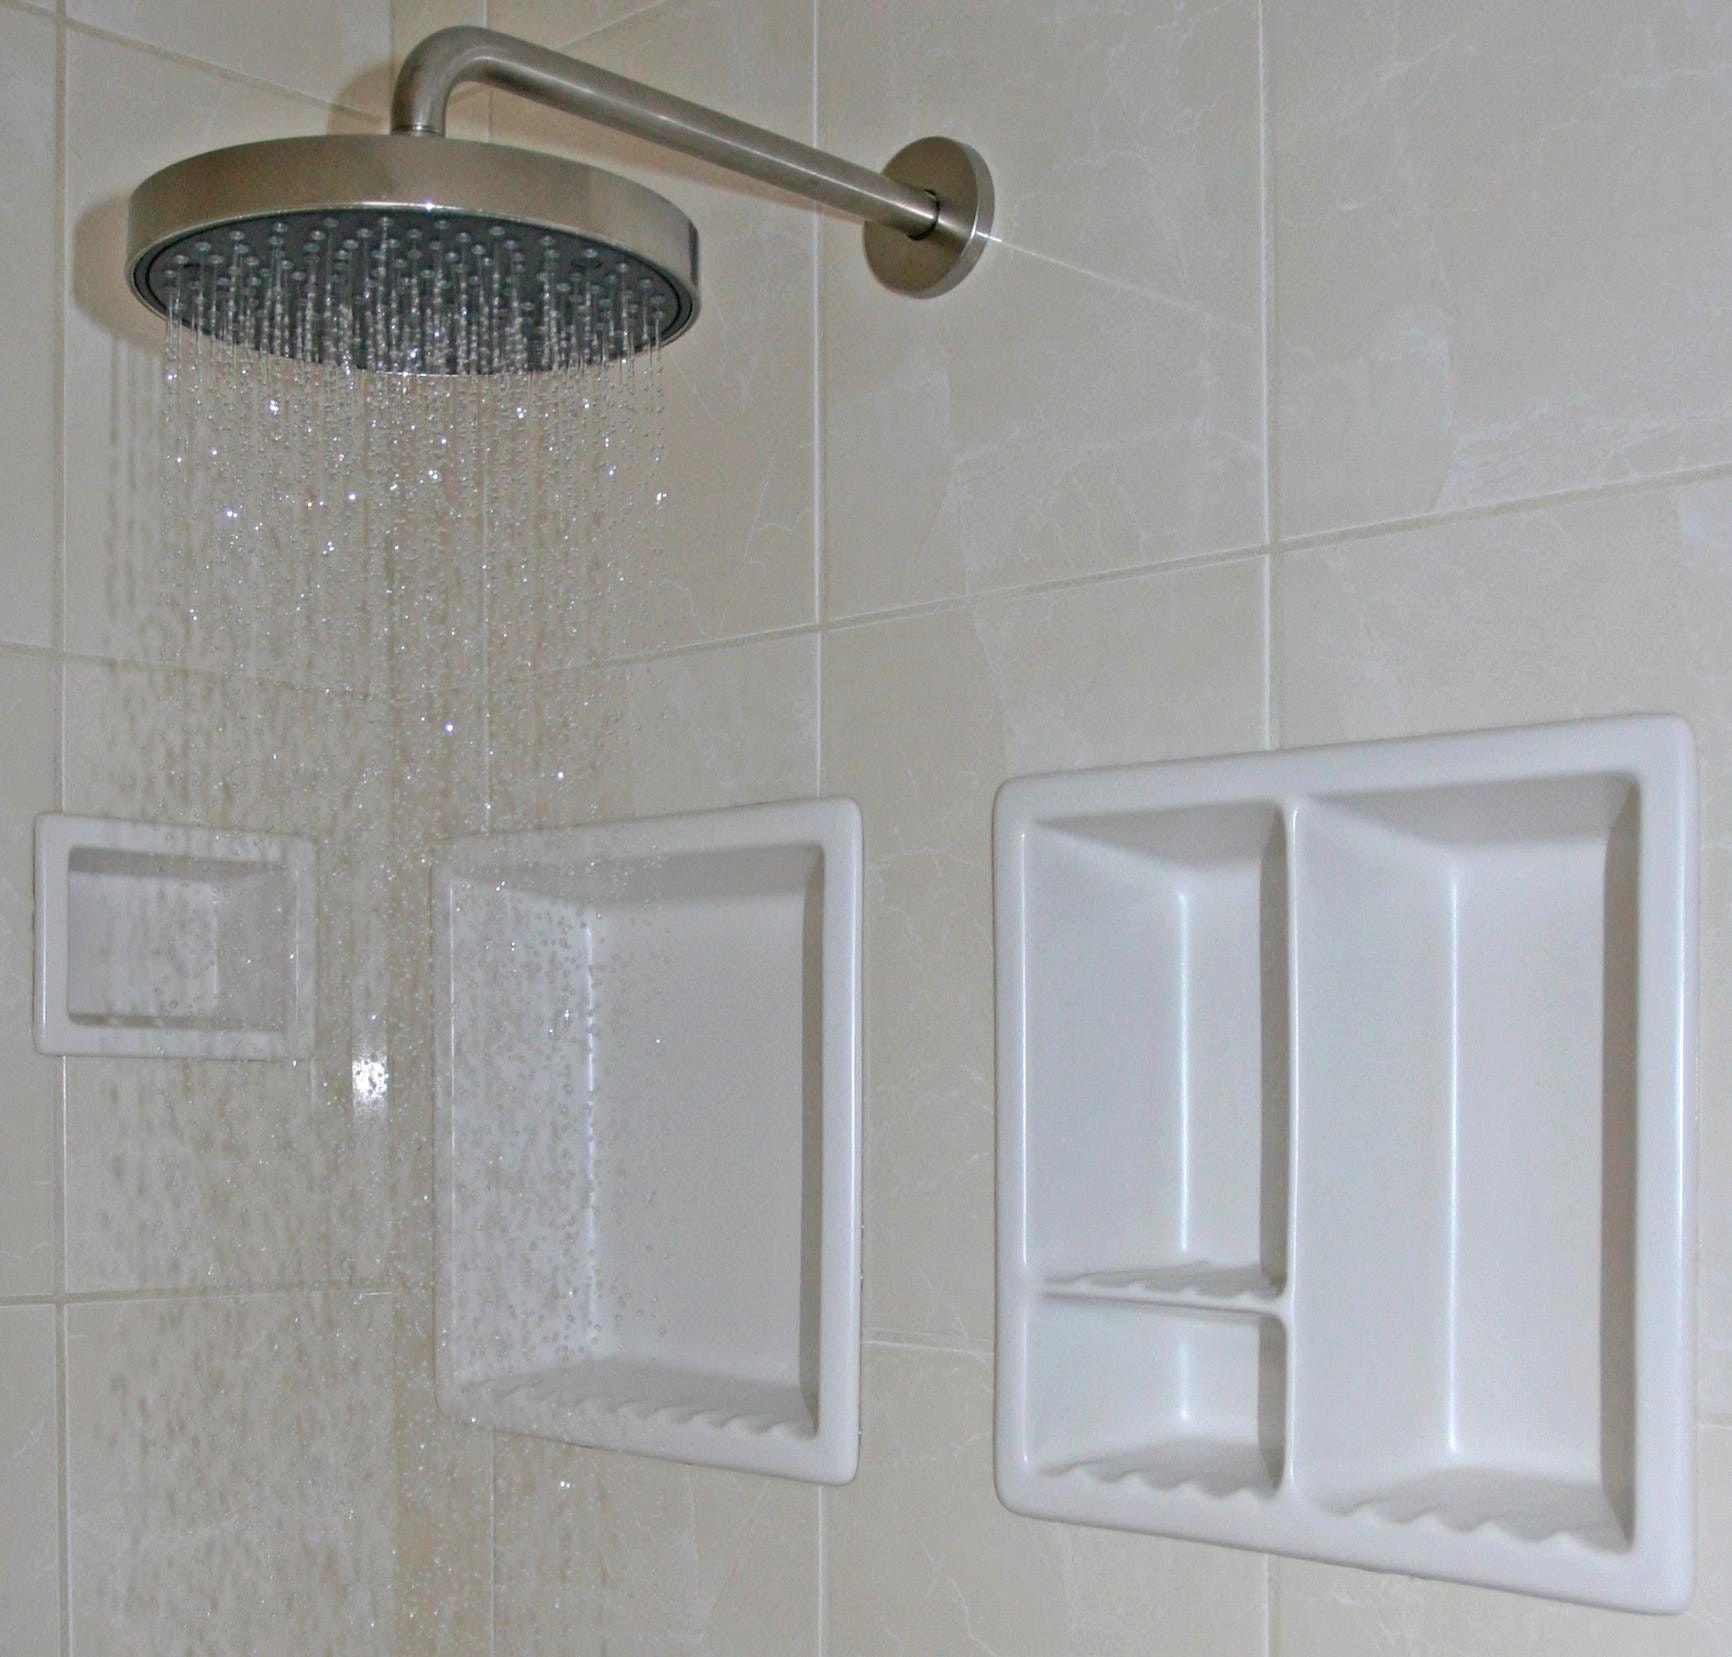 Tile shower shelf ideas lustwithalaugh design recessed shower